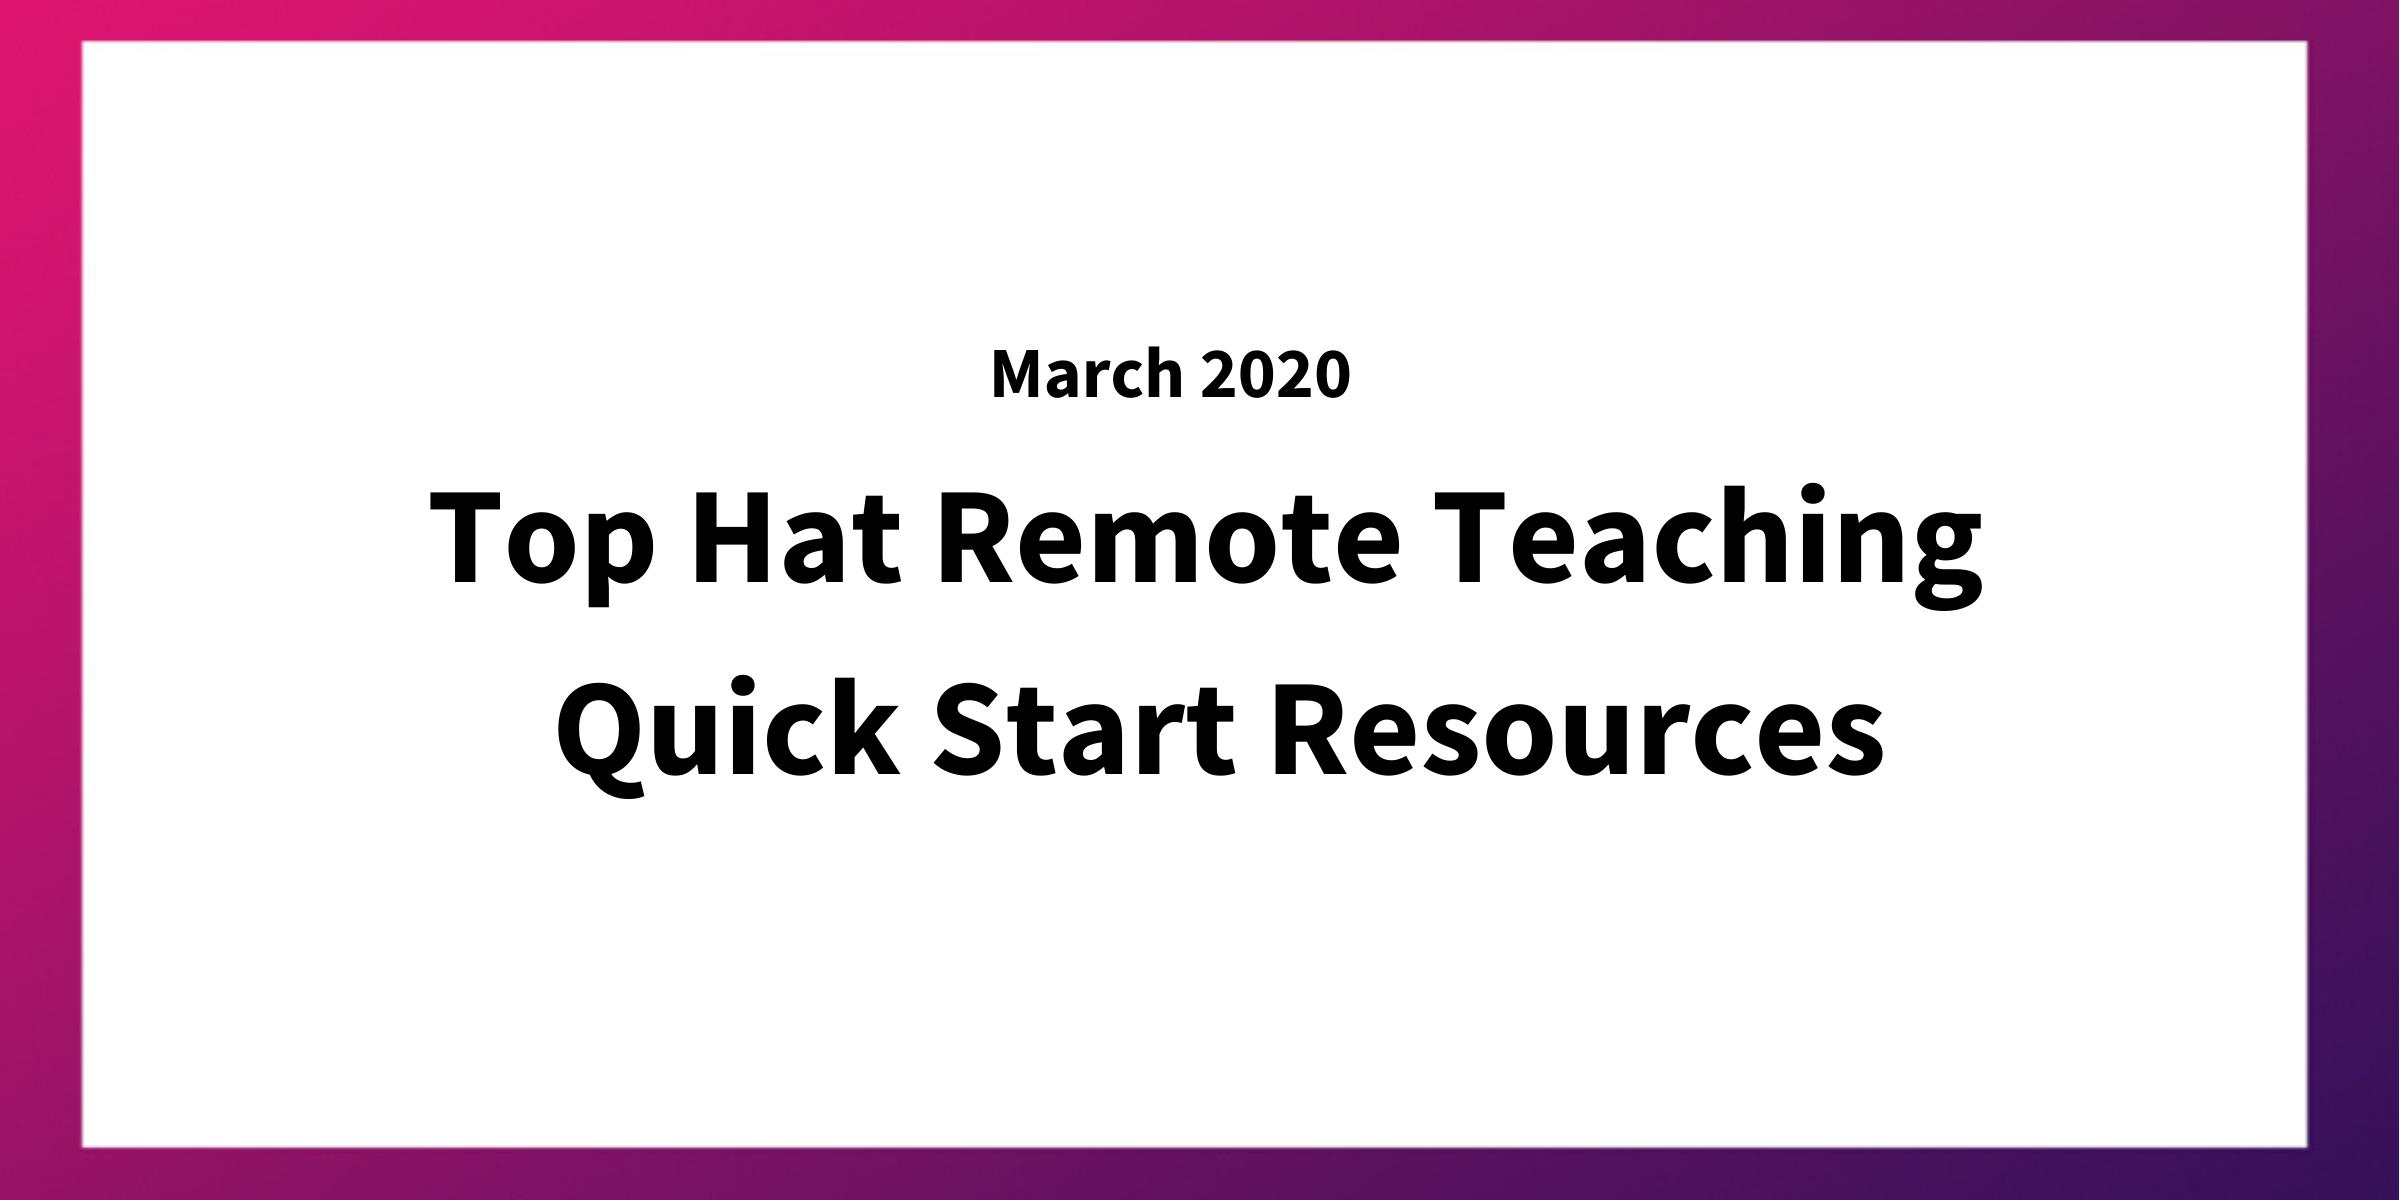 Top Hat Remote Teaching Quick Start Resources